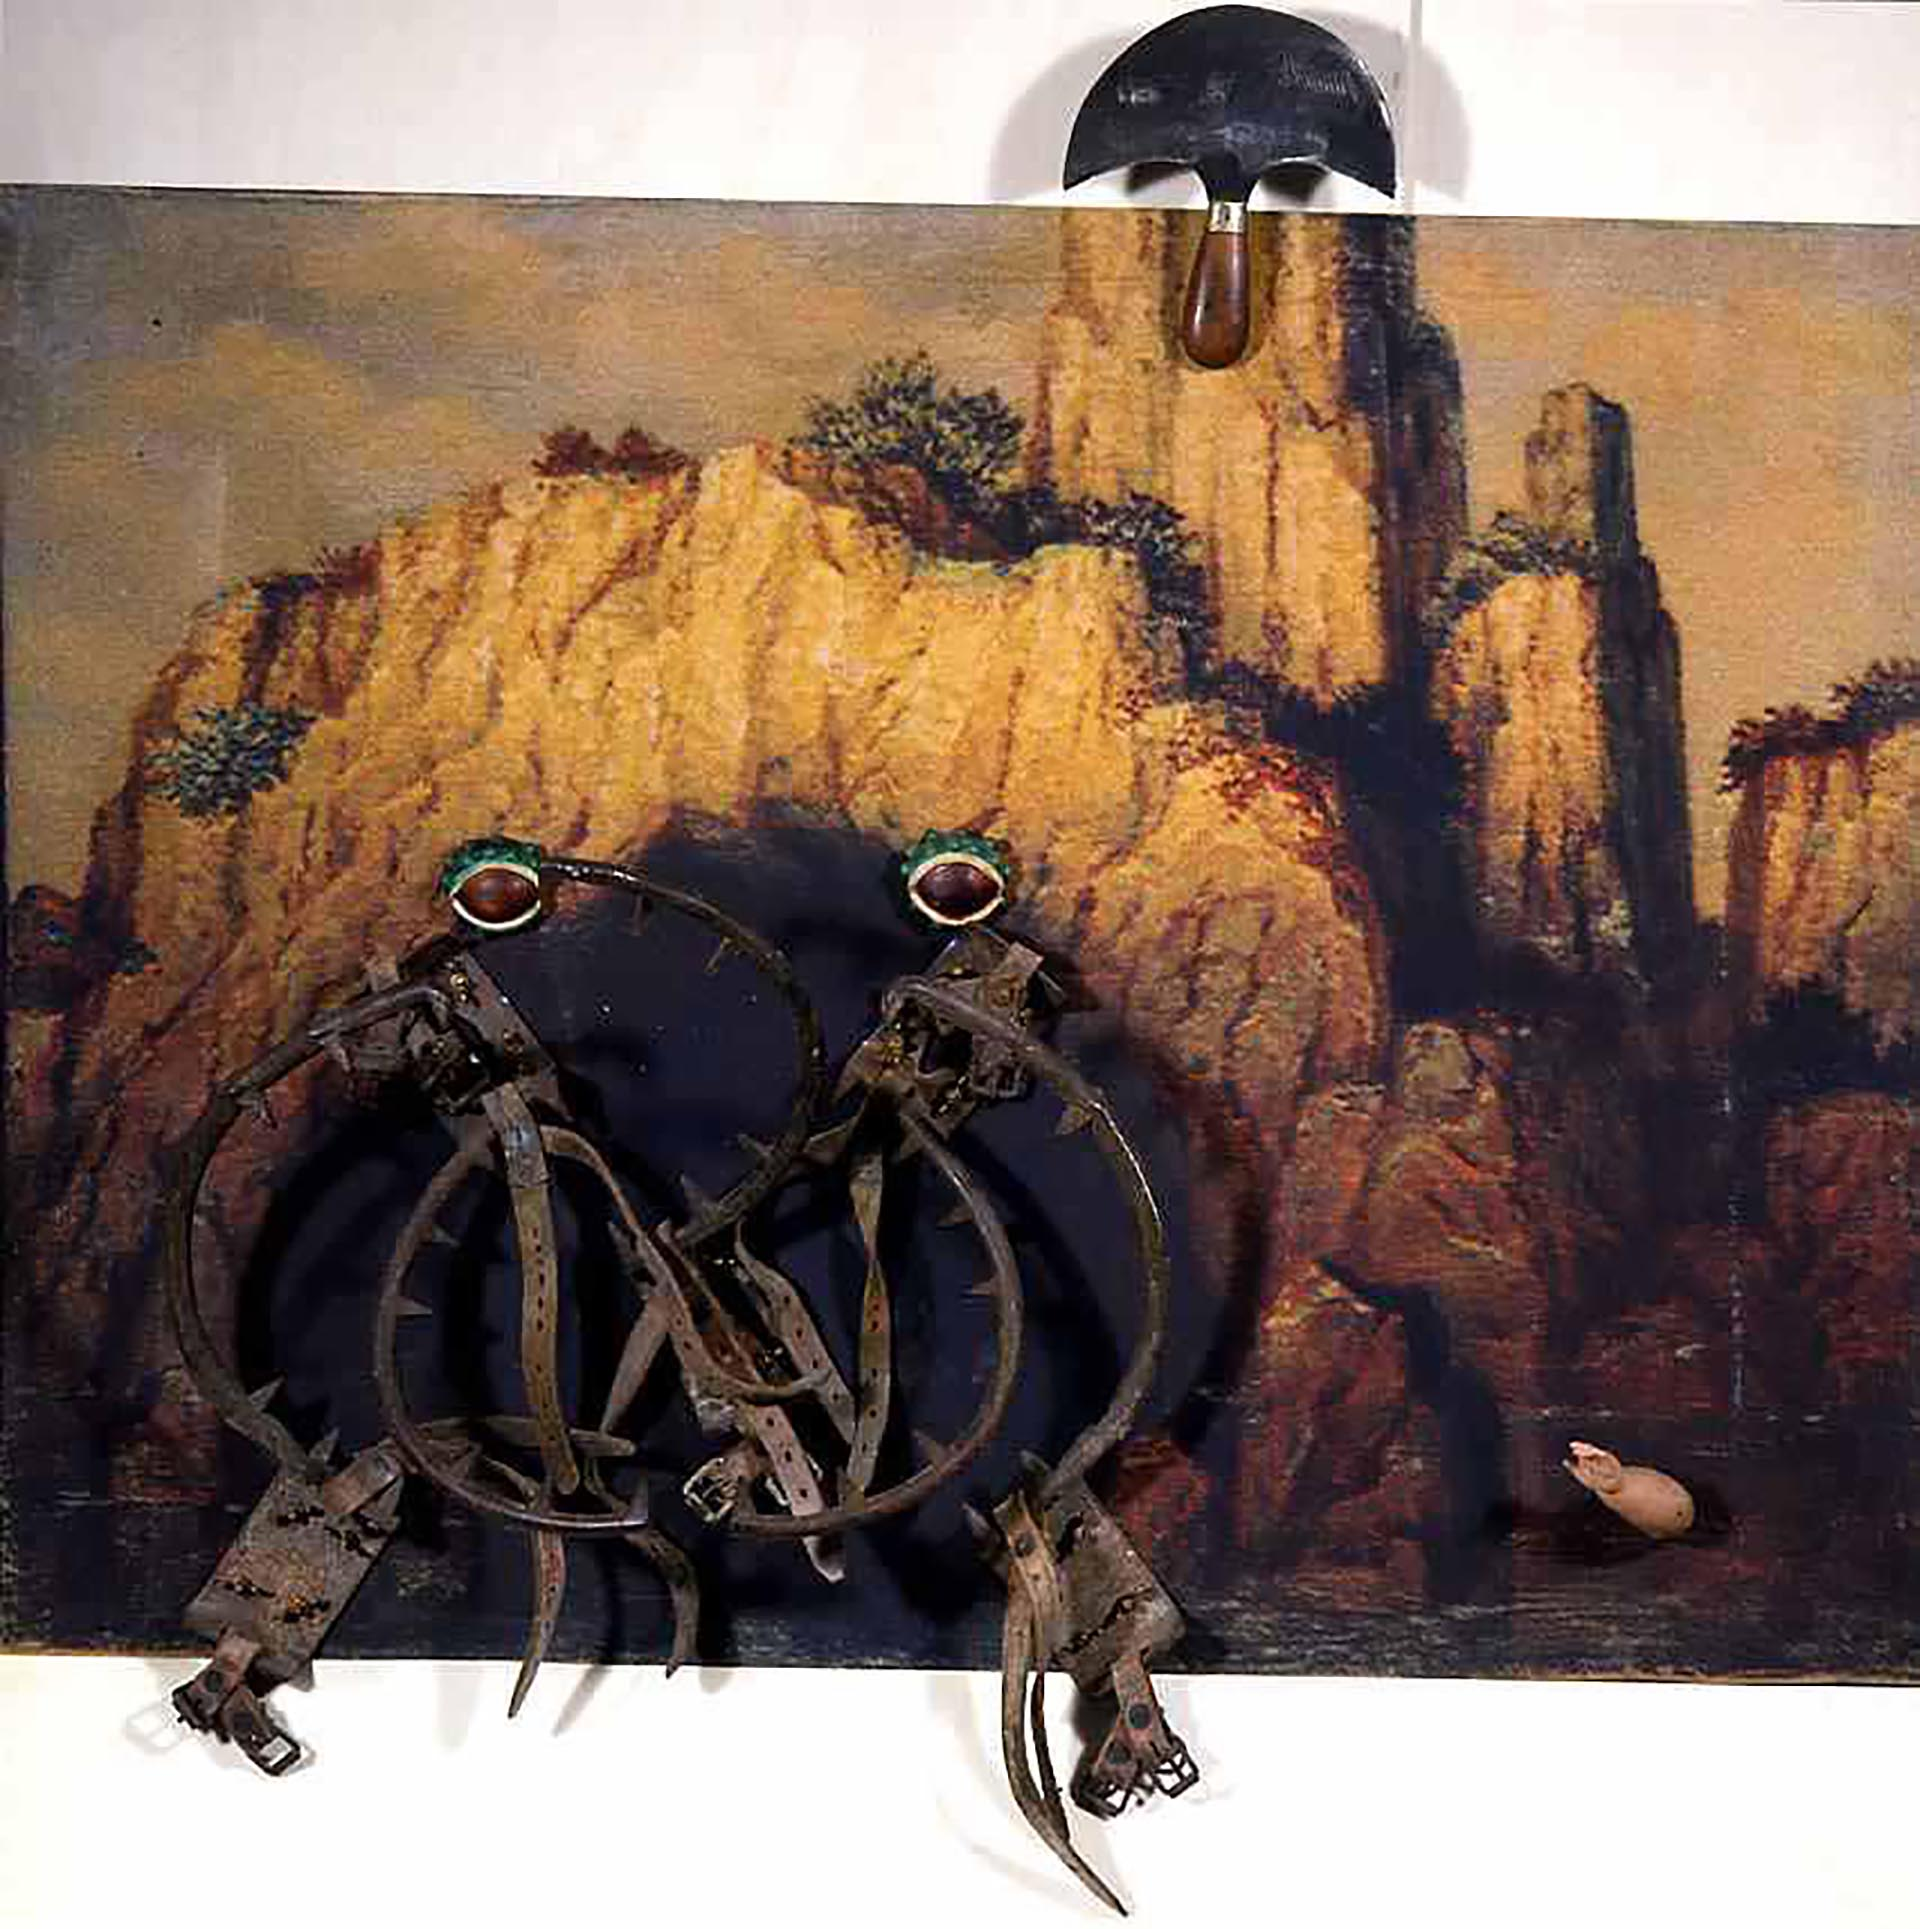 Spoerri, The toads, 1990, 104x122x22 cm